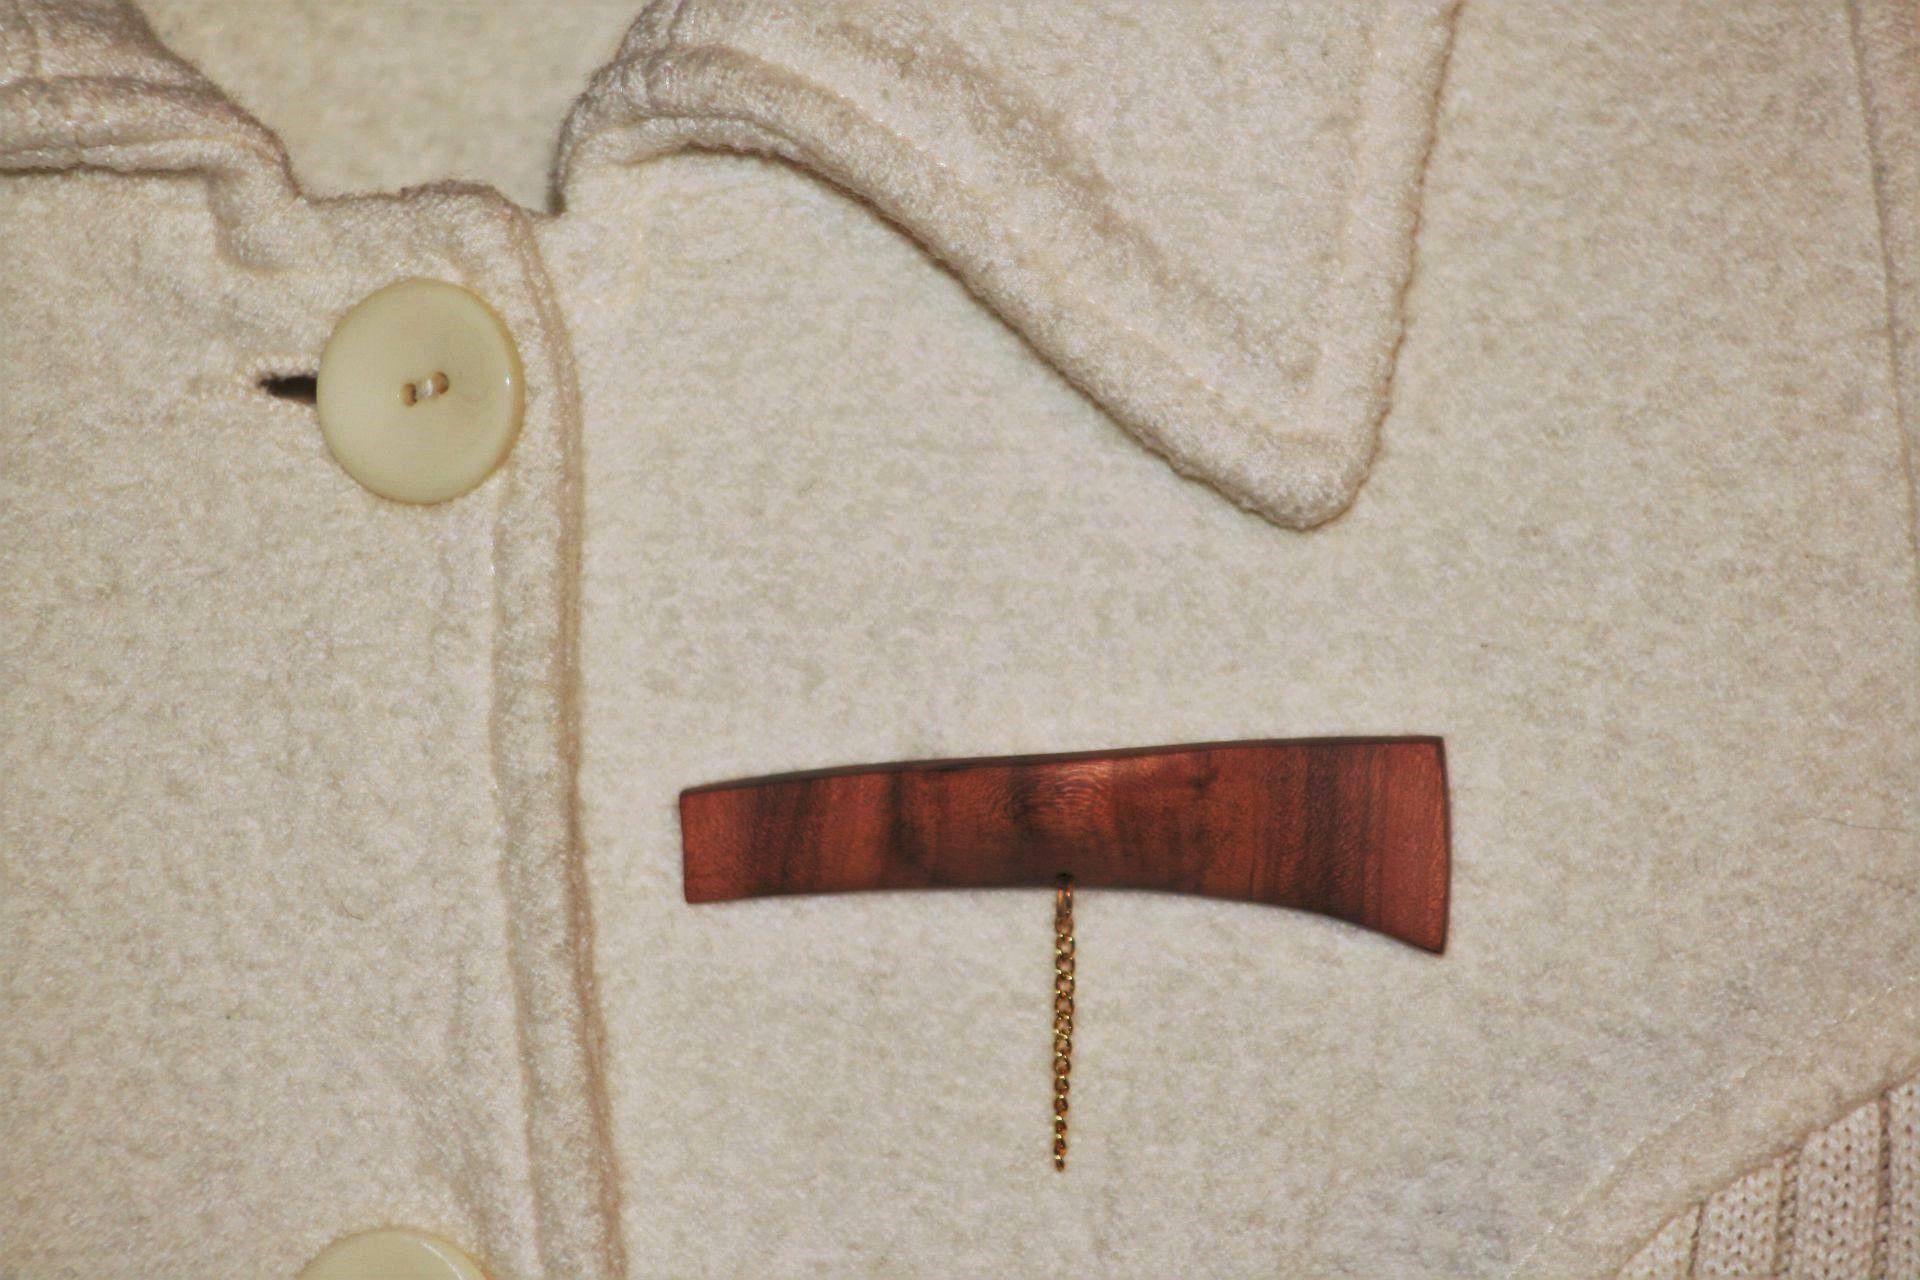 apricot wood jewellery brooch unique handmade sanisio artist design classic style jewelry